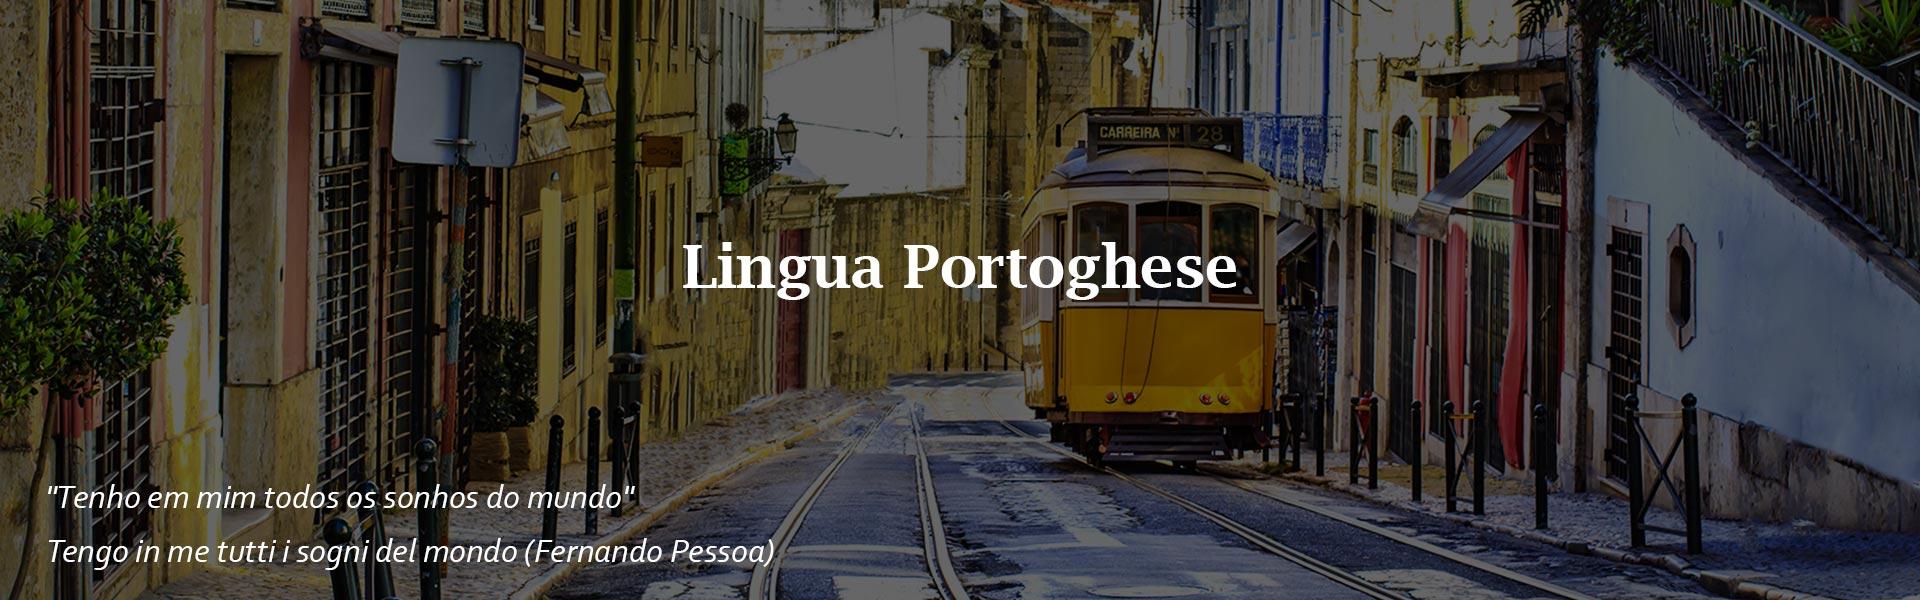 lingua-Portoghese-Alif